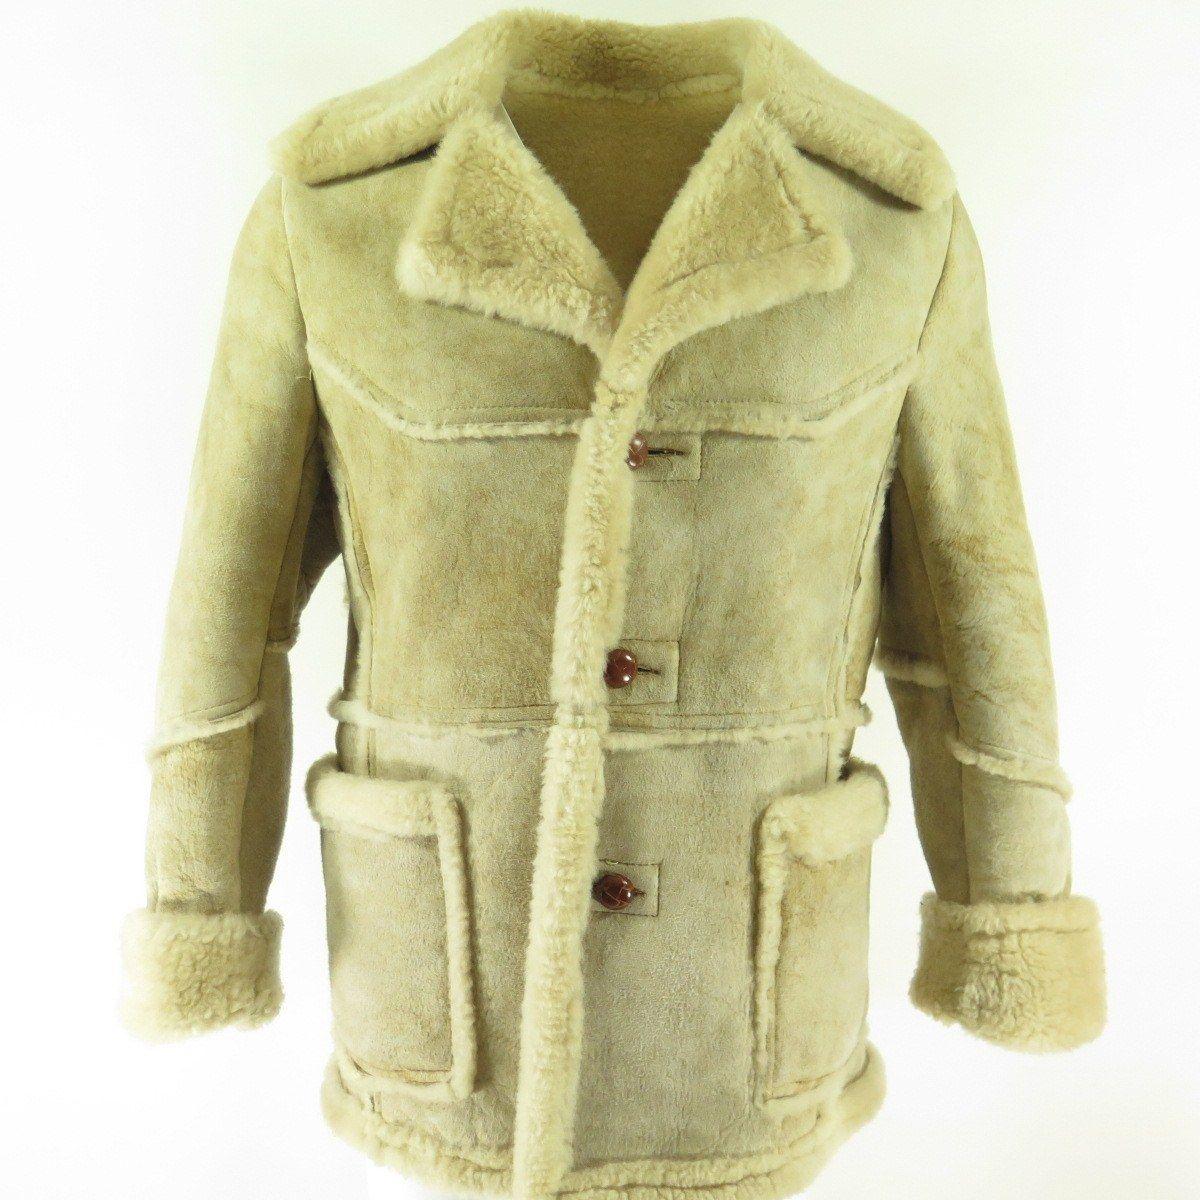 Vintage 80s Marlboro Man Shearling Coat Mens M Sheepskin Western Jacket The Clothing Vault Shearling Coat Coat Sheepskin Coat [ 1200 x 1200 Pixel ]